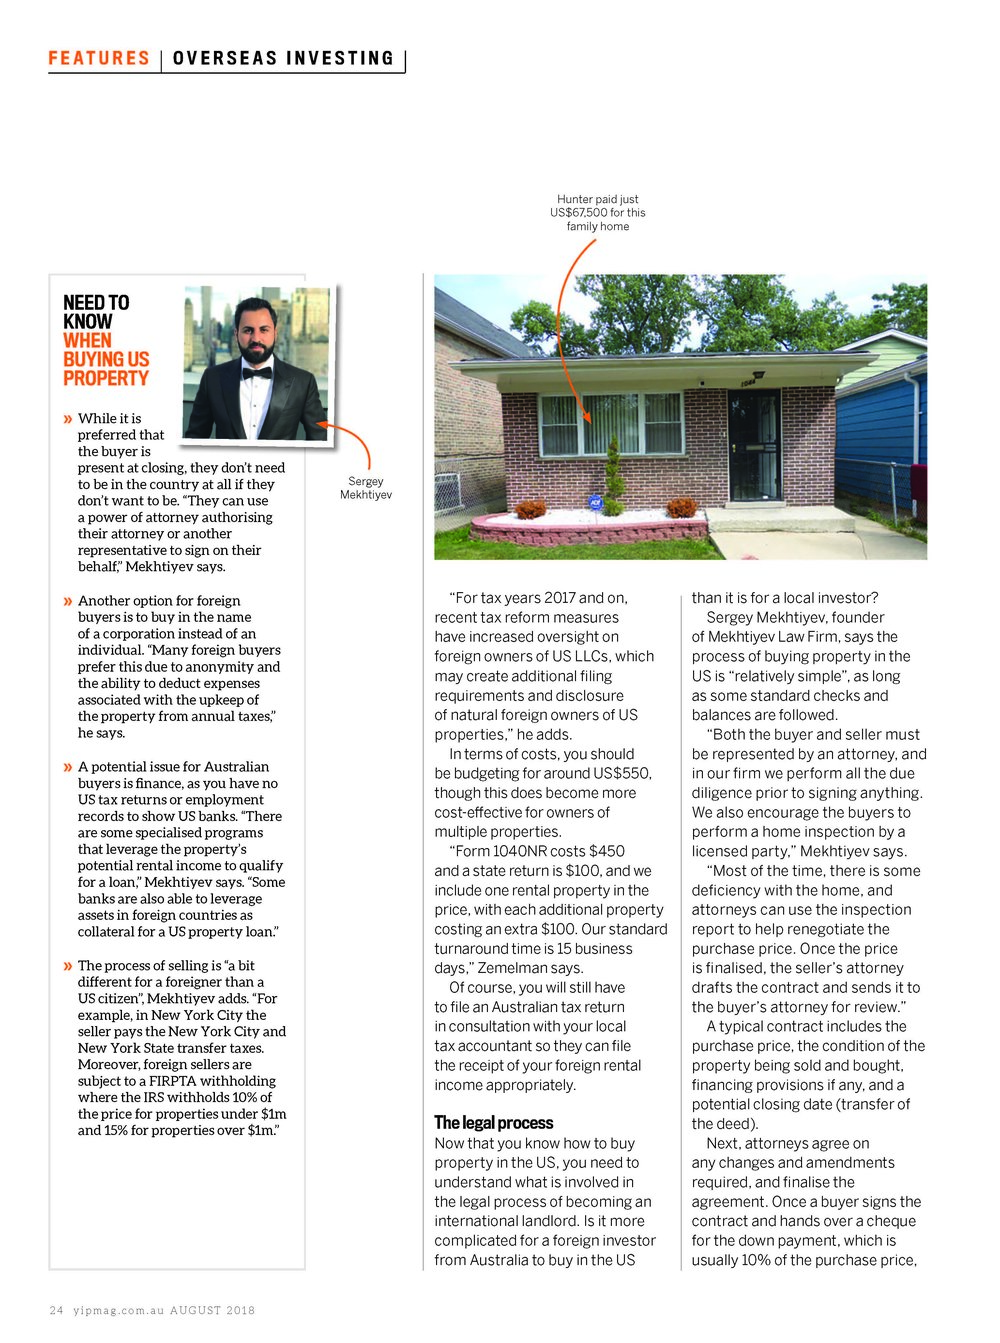 Mekhtiyev Law Investing in US Real Estate